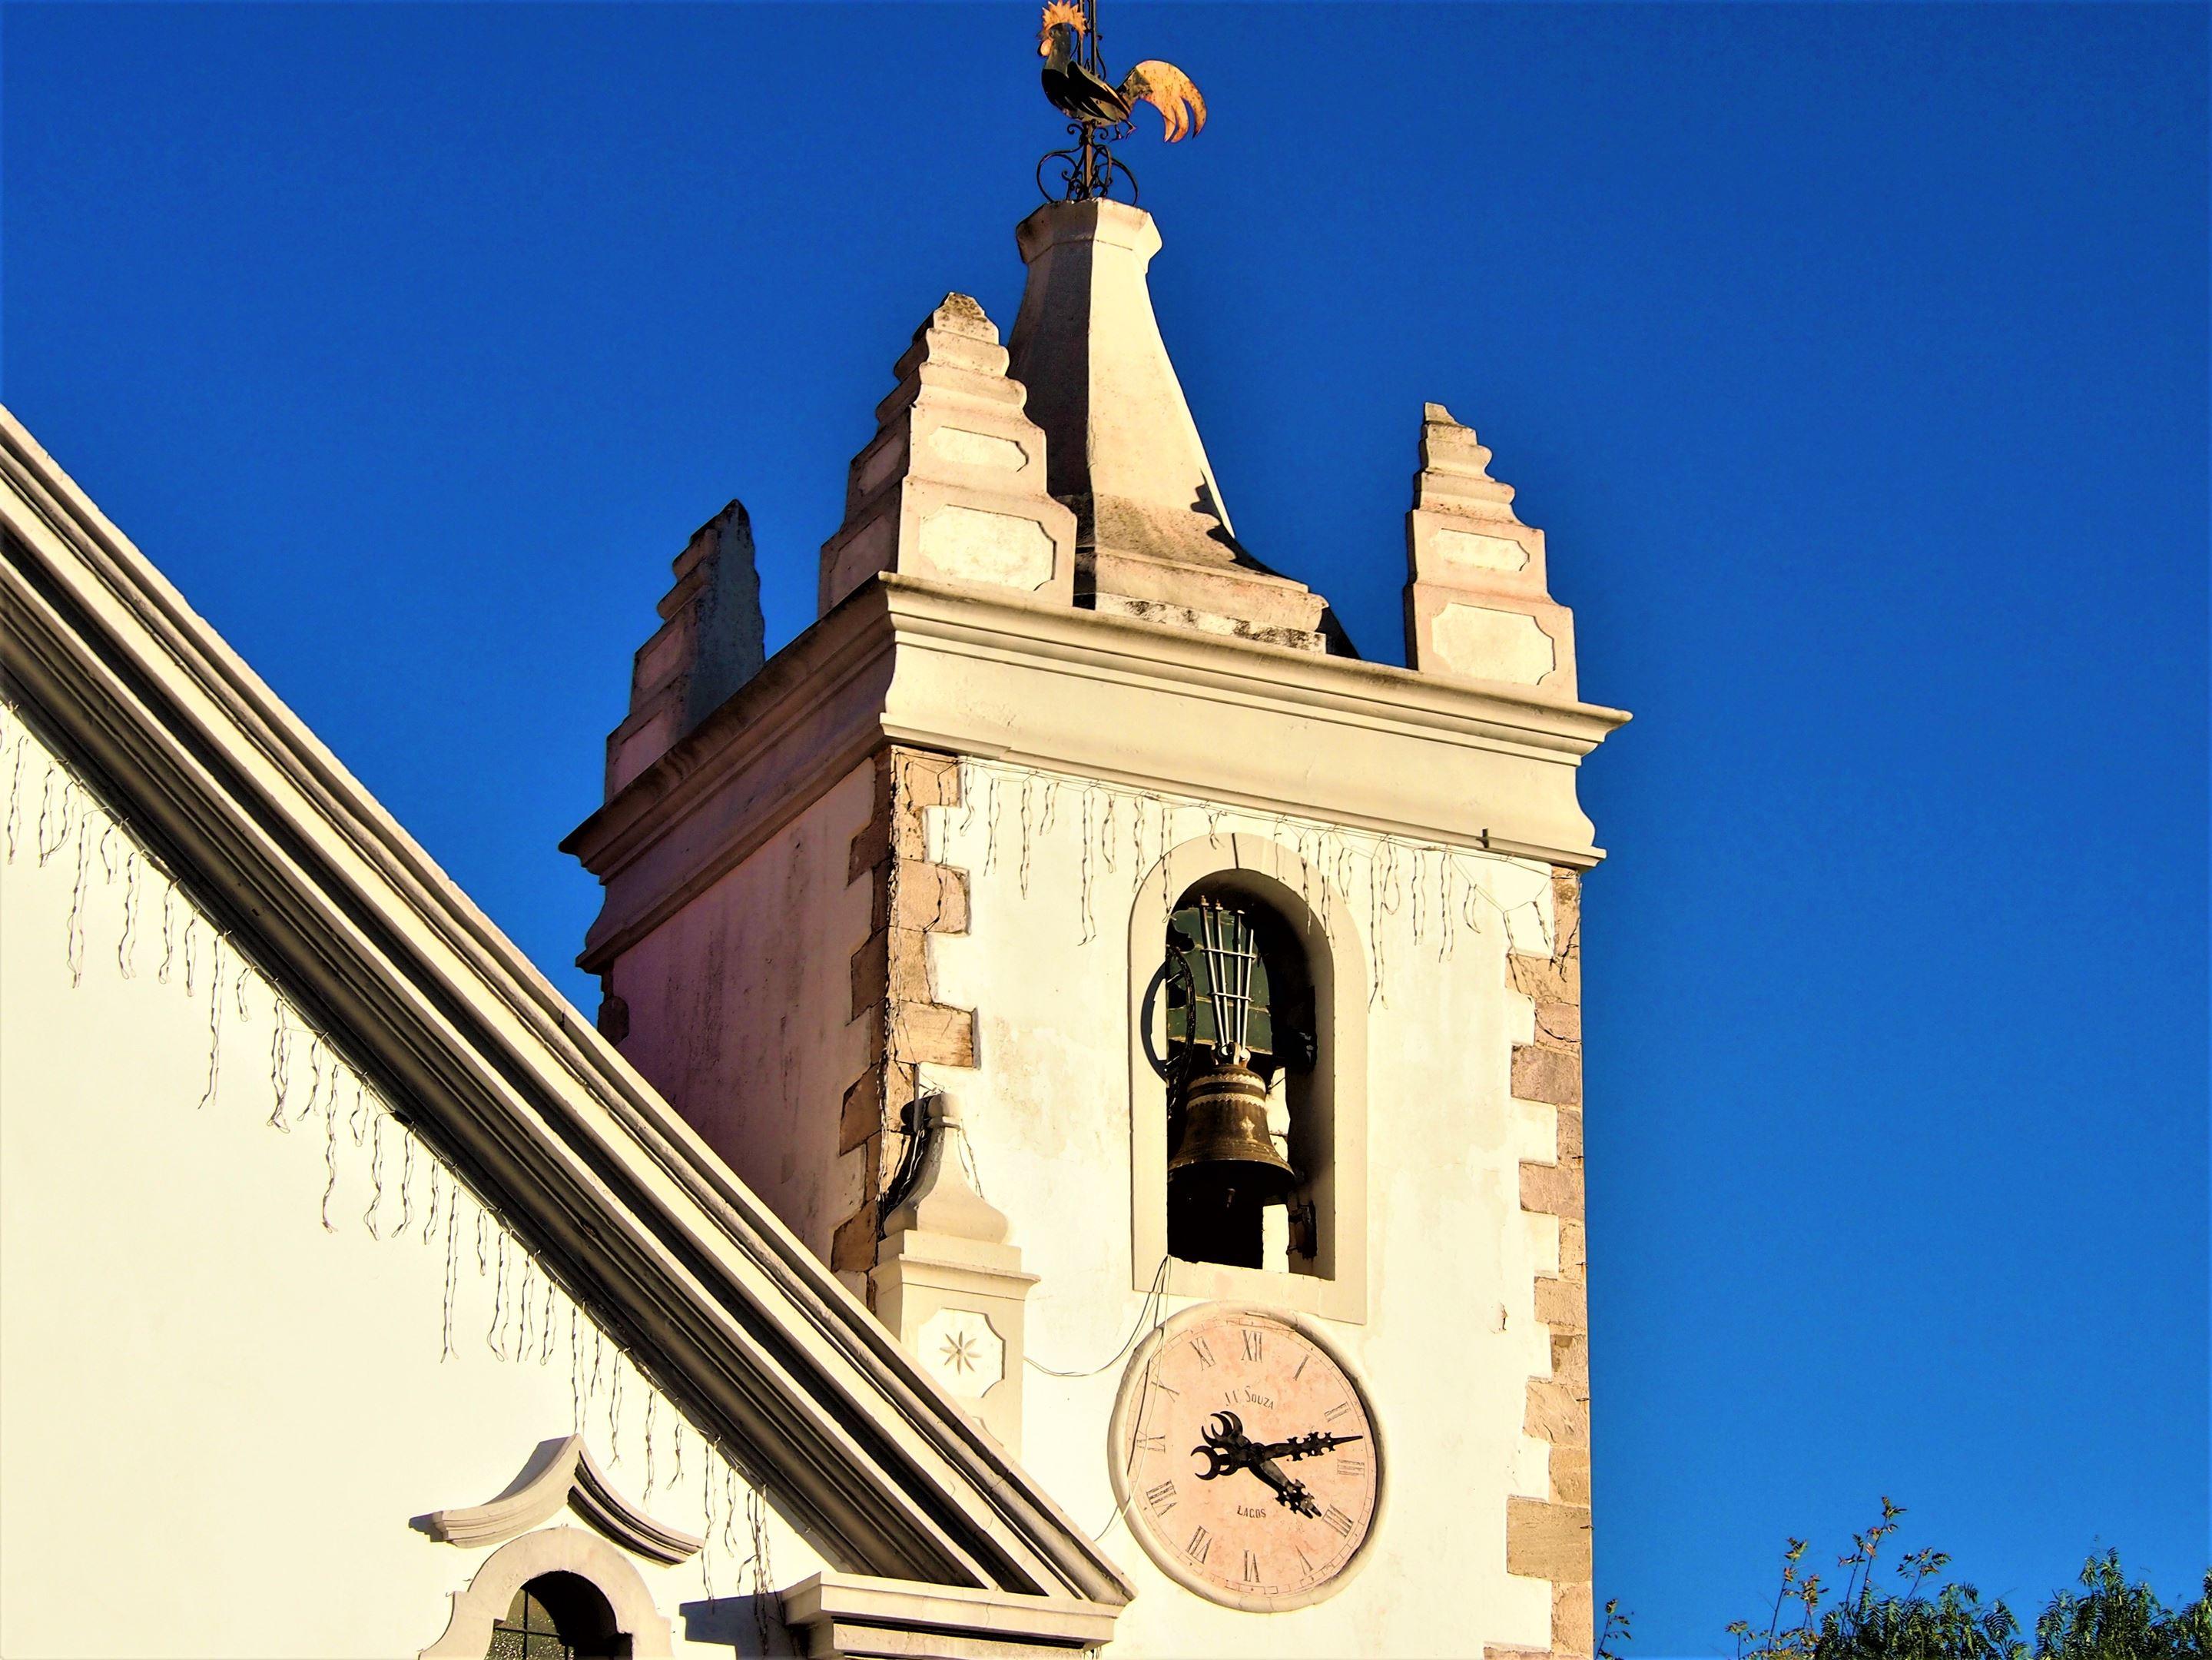 Igreja Matriz de Alte - Clocktower, Alte, Algarve